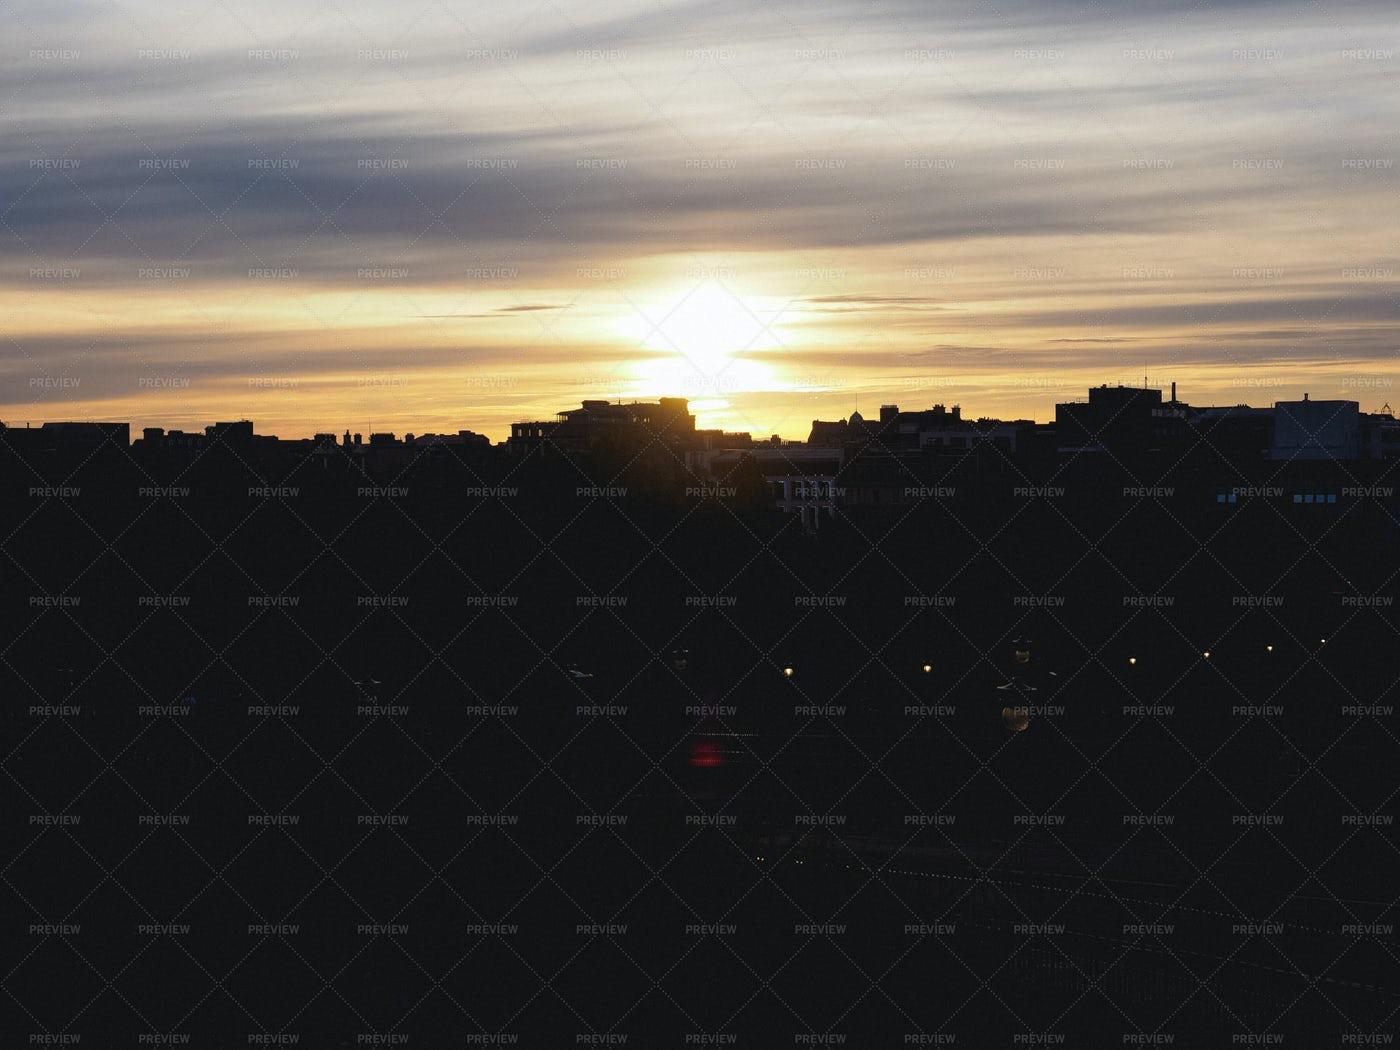 City Skyline At Sunset: Stock Photos